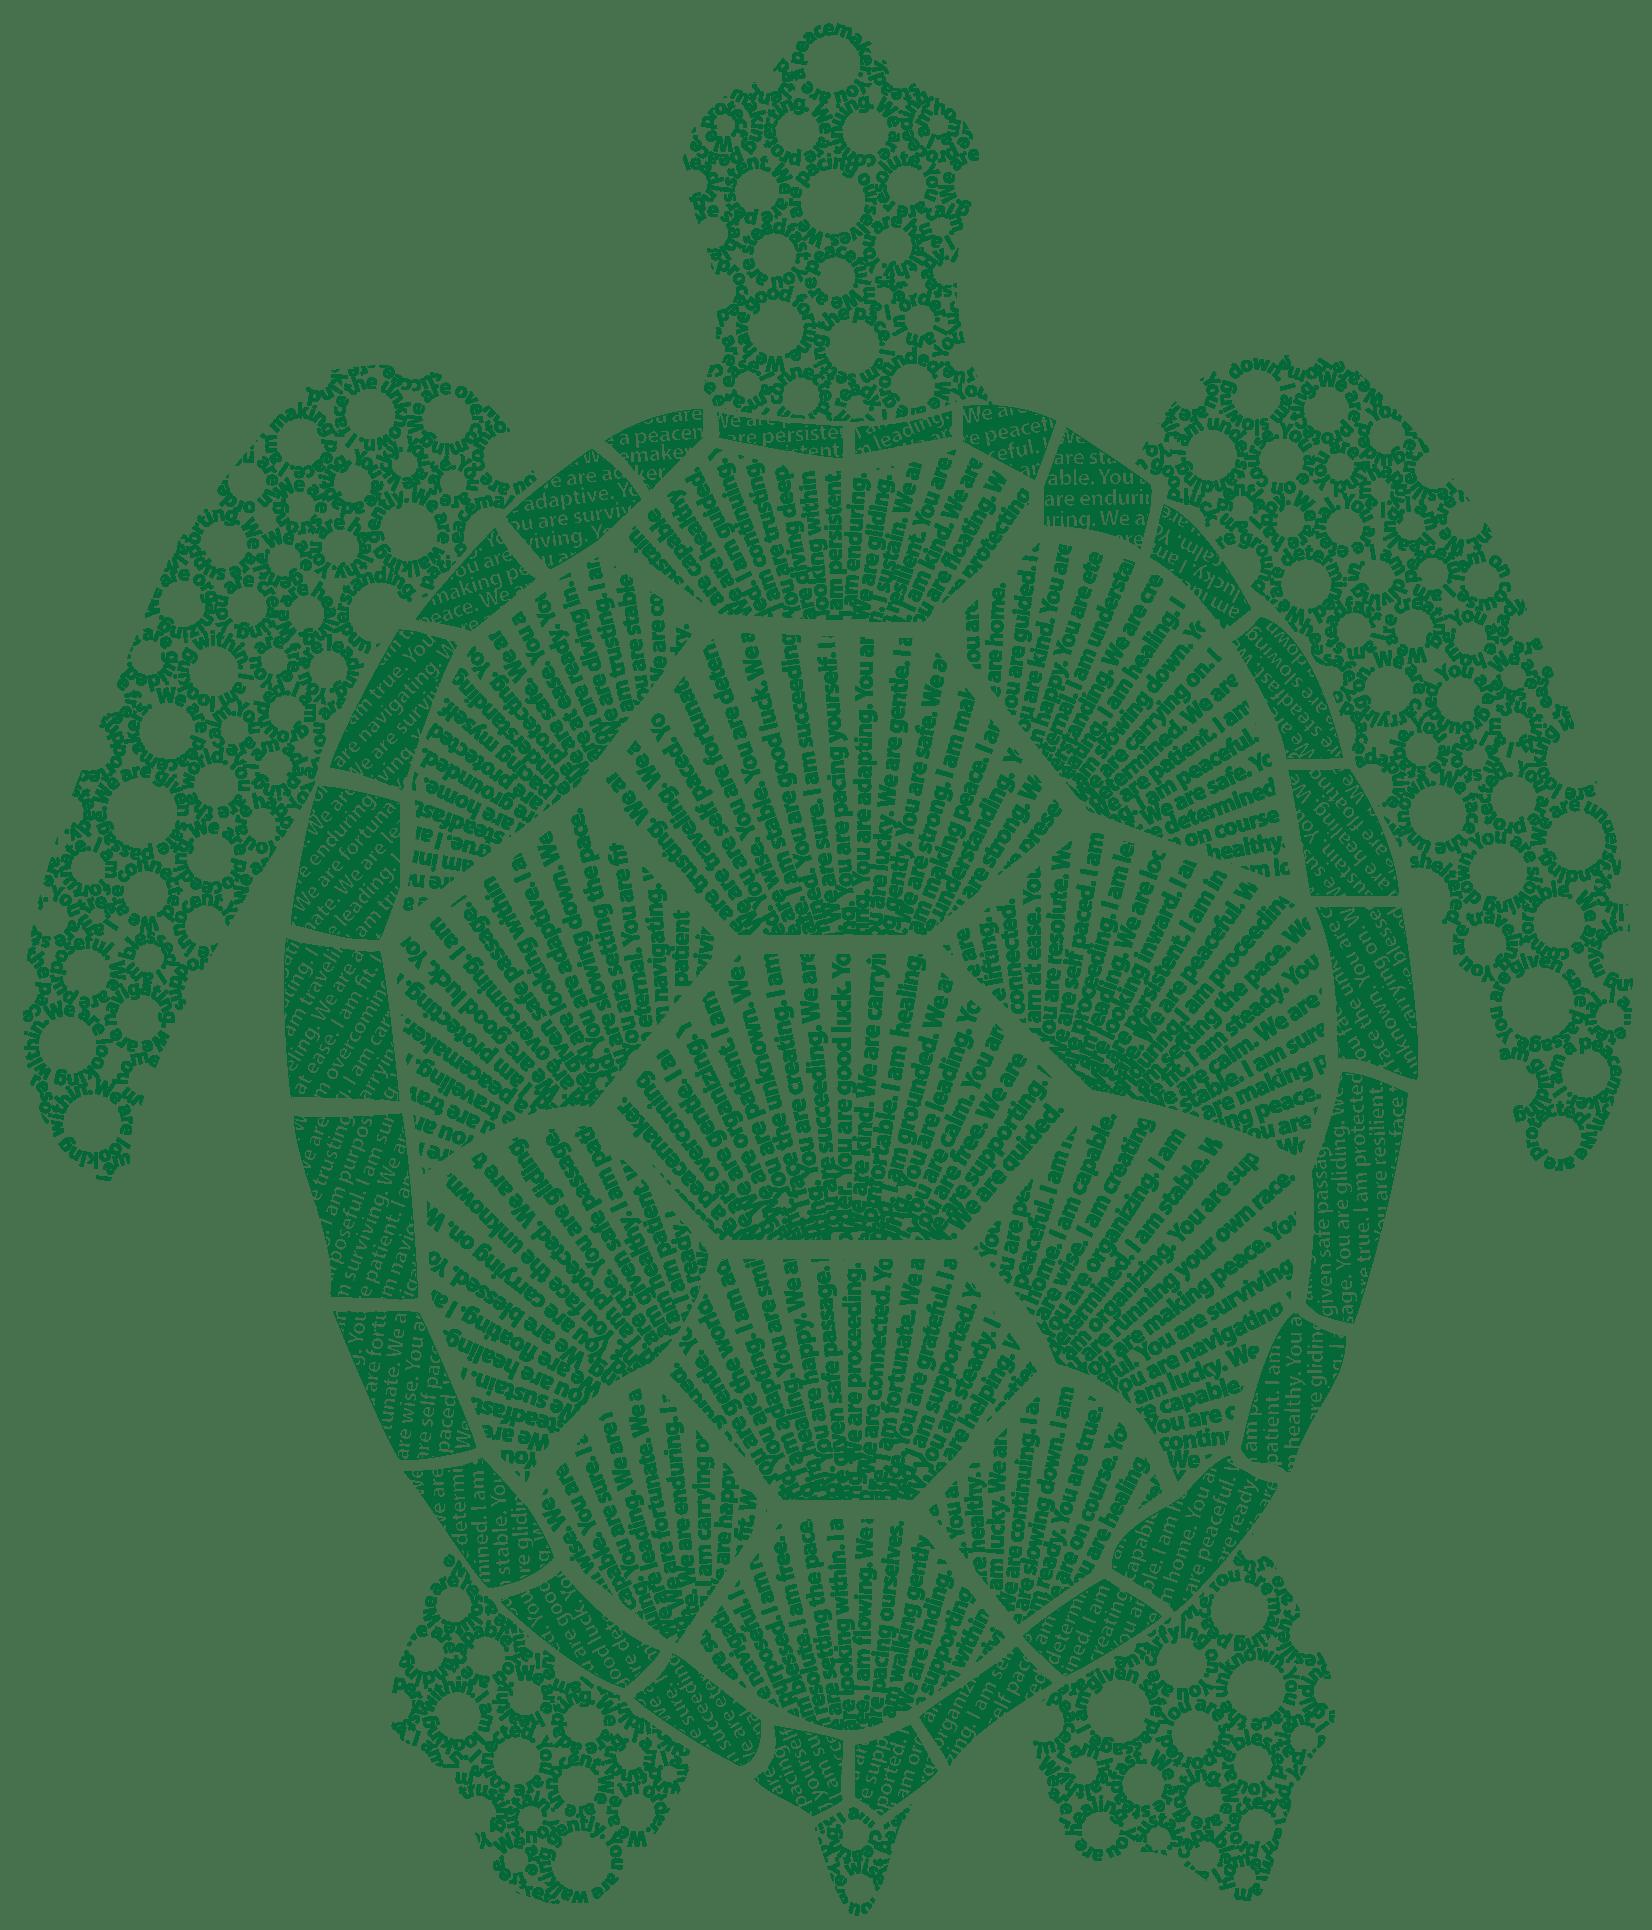 Sea turtle symbolism design made of turtle affirmations sea turtle design made of affirmations about its symbolism biocorpaavc Choice Image